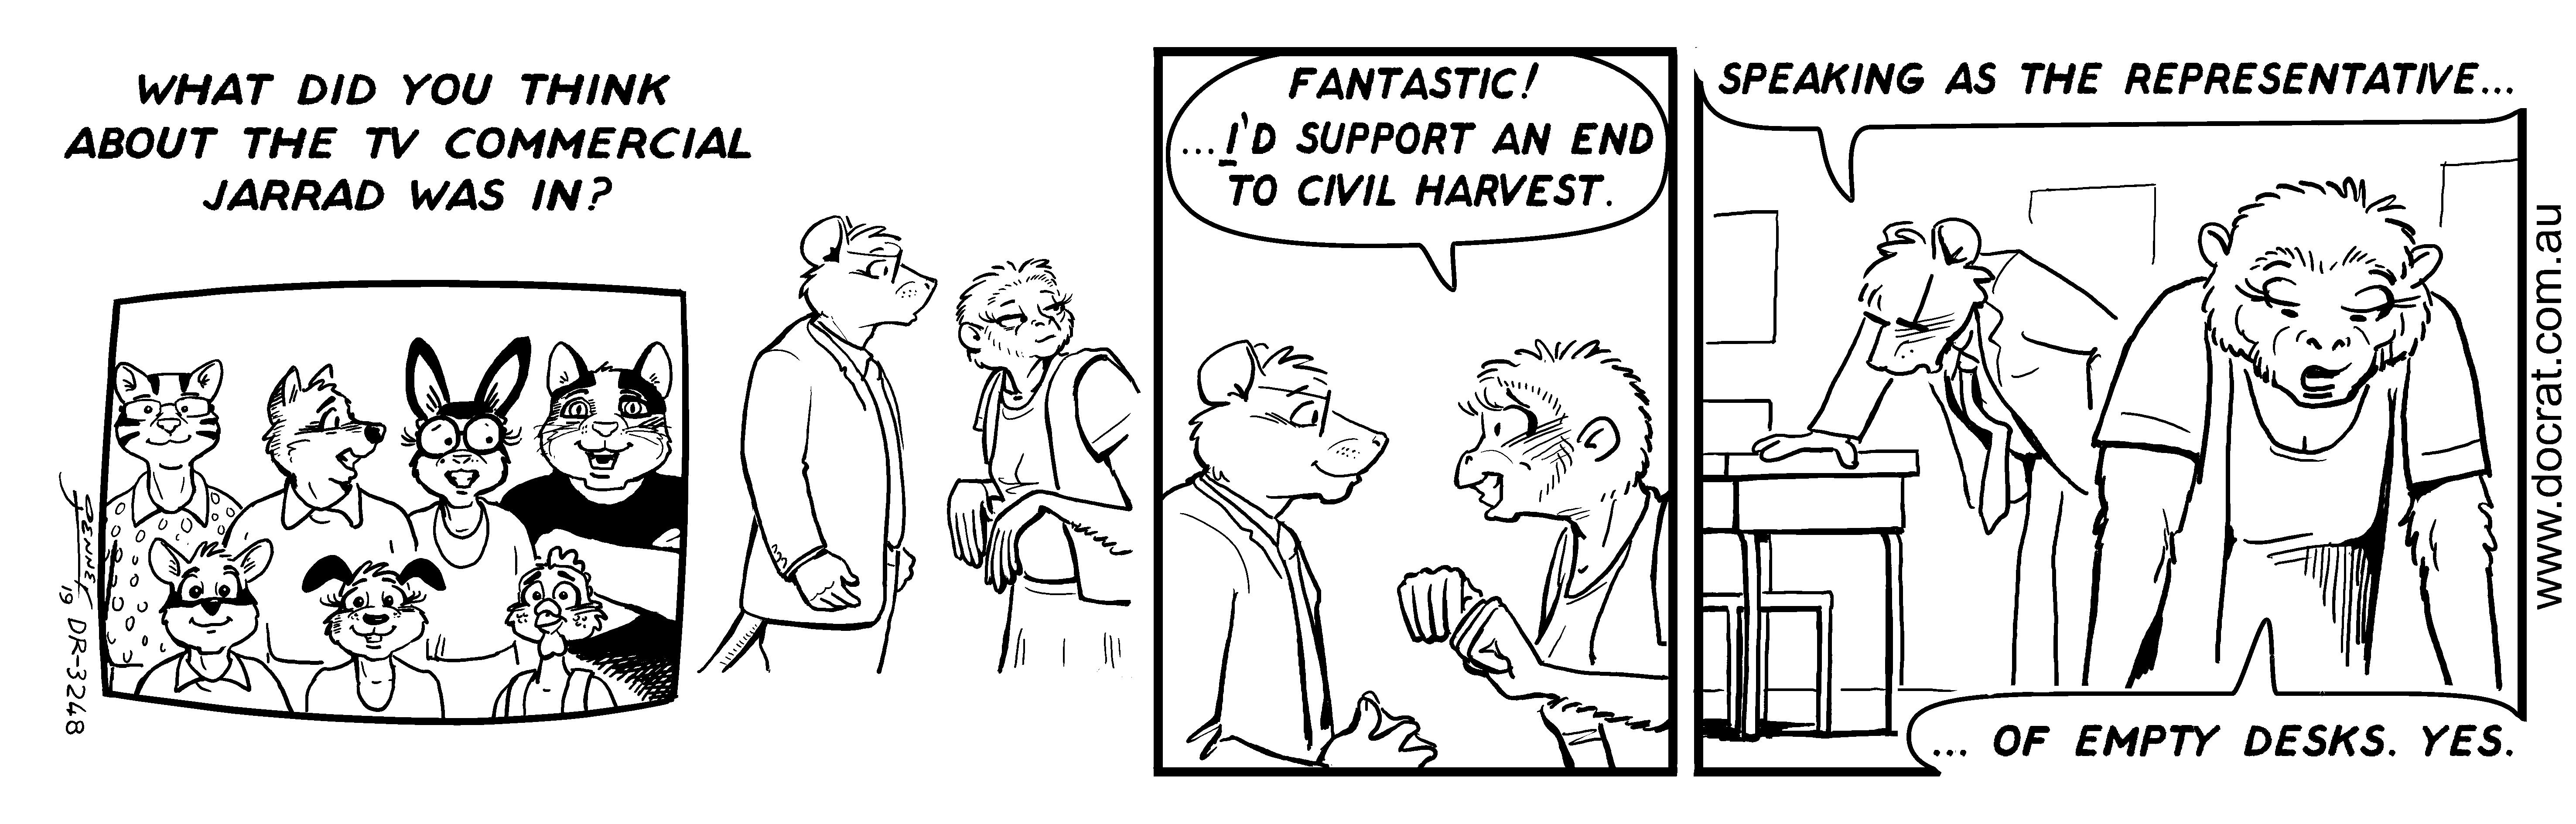 20190522